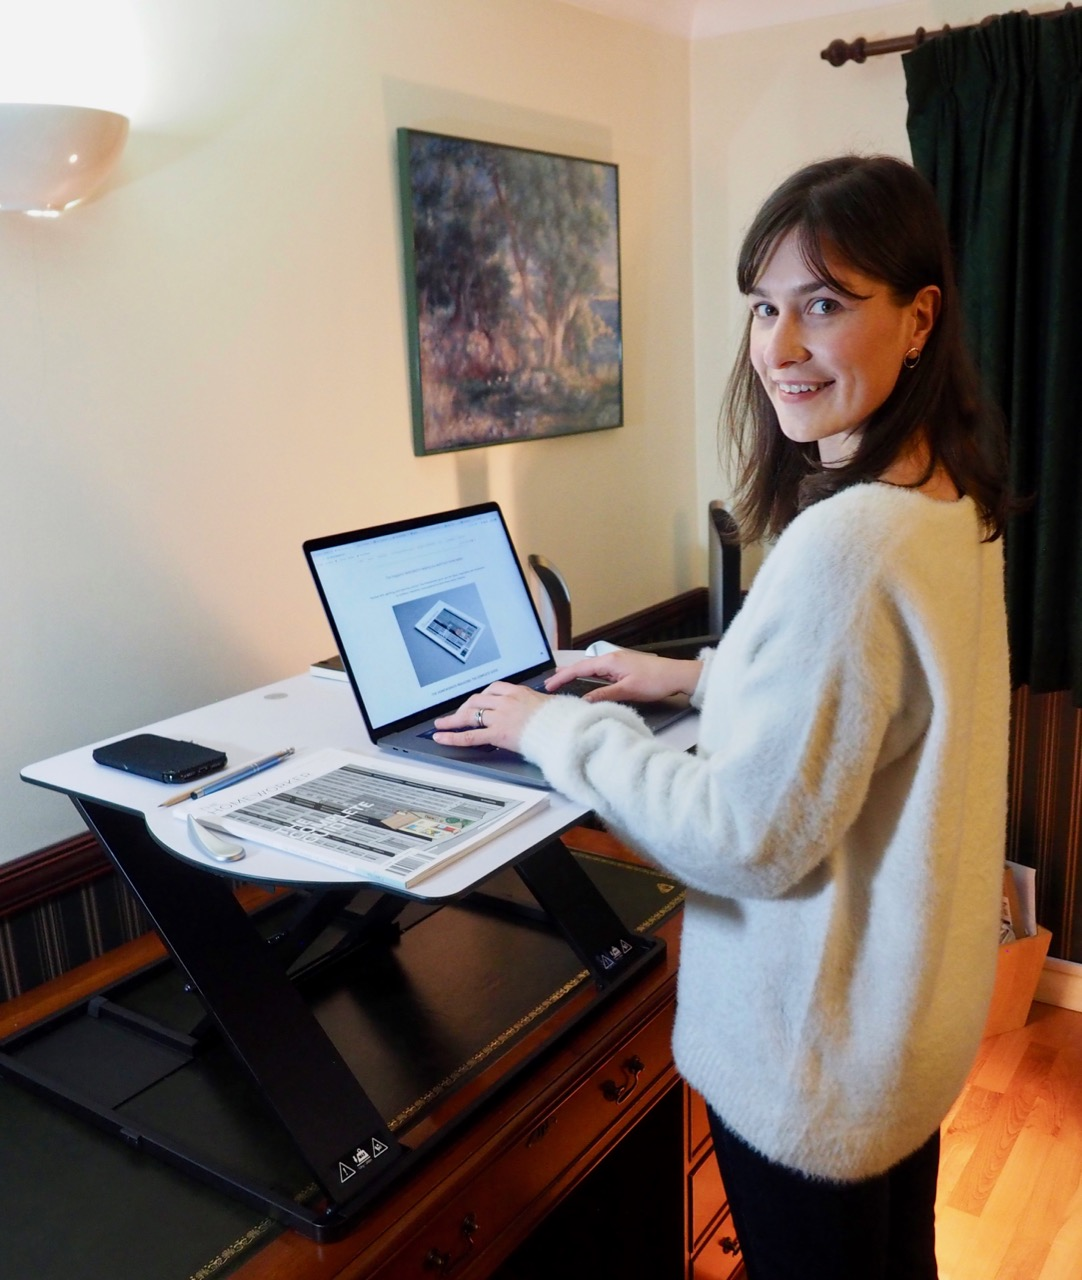 louise goss posturite oploft standing desk review for the Homeworker